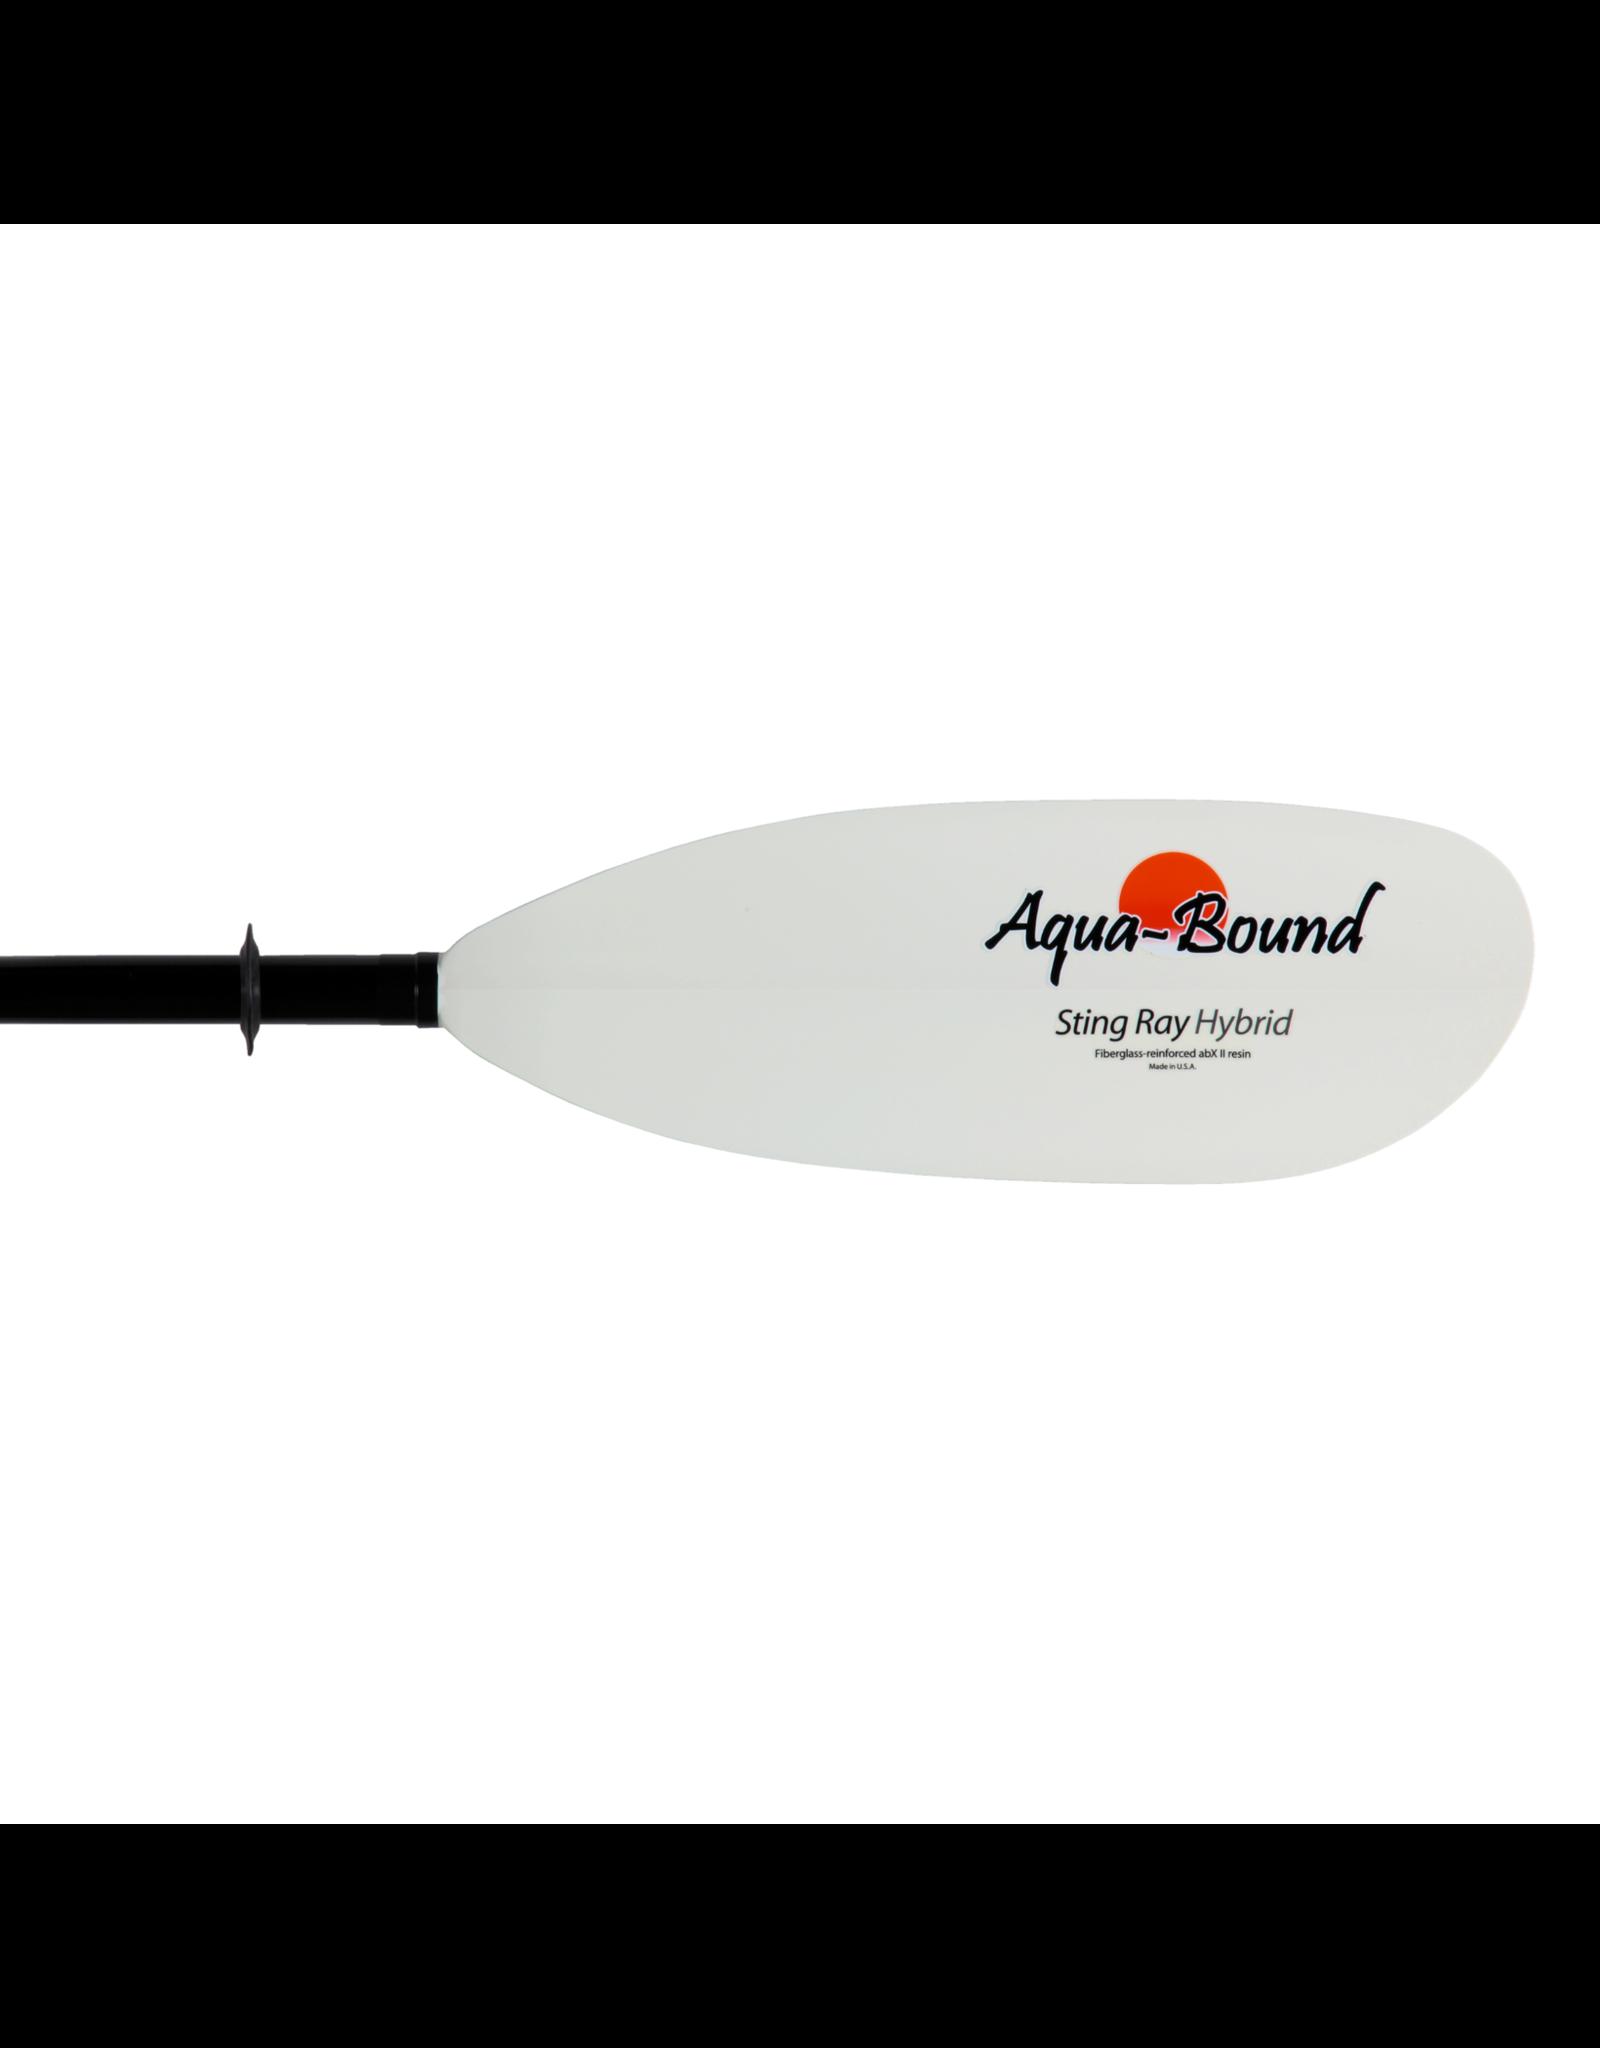 Aqua-Bound Aqua-Bound Sting Ray Hybrid Posi-lock paddle